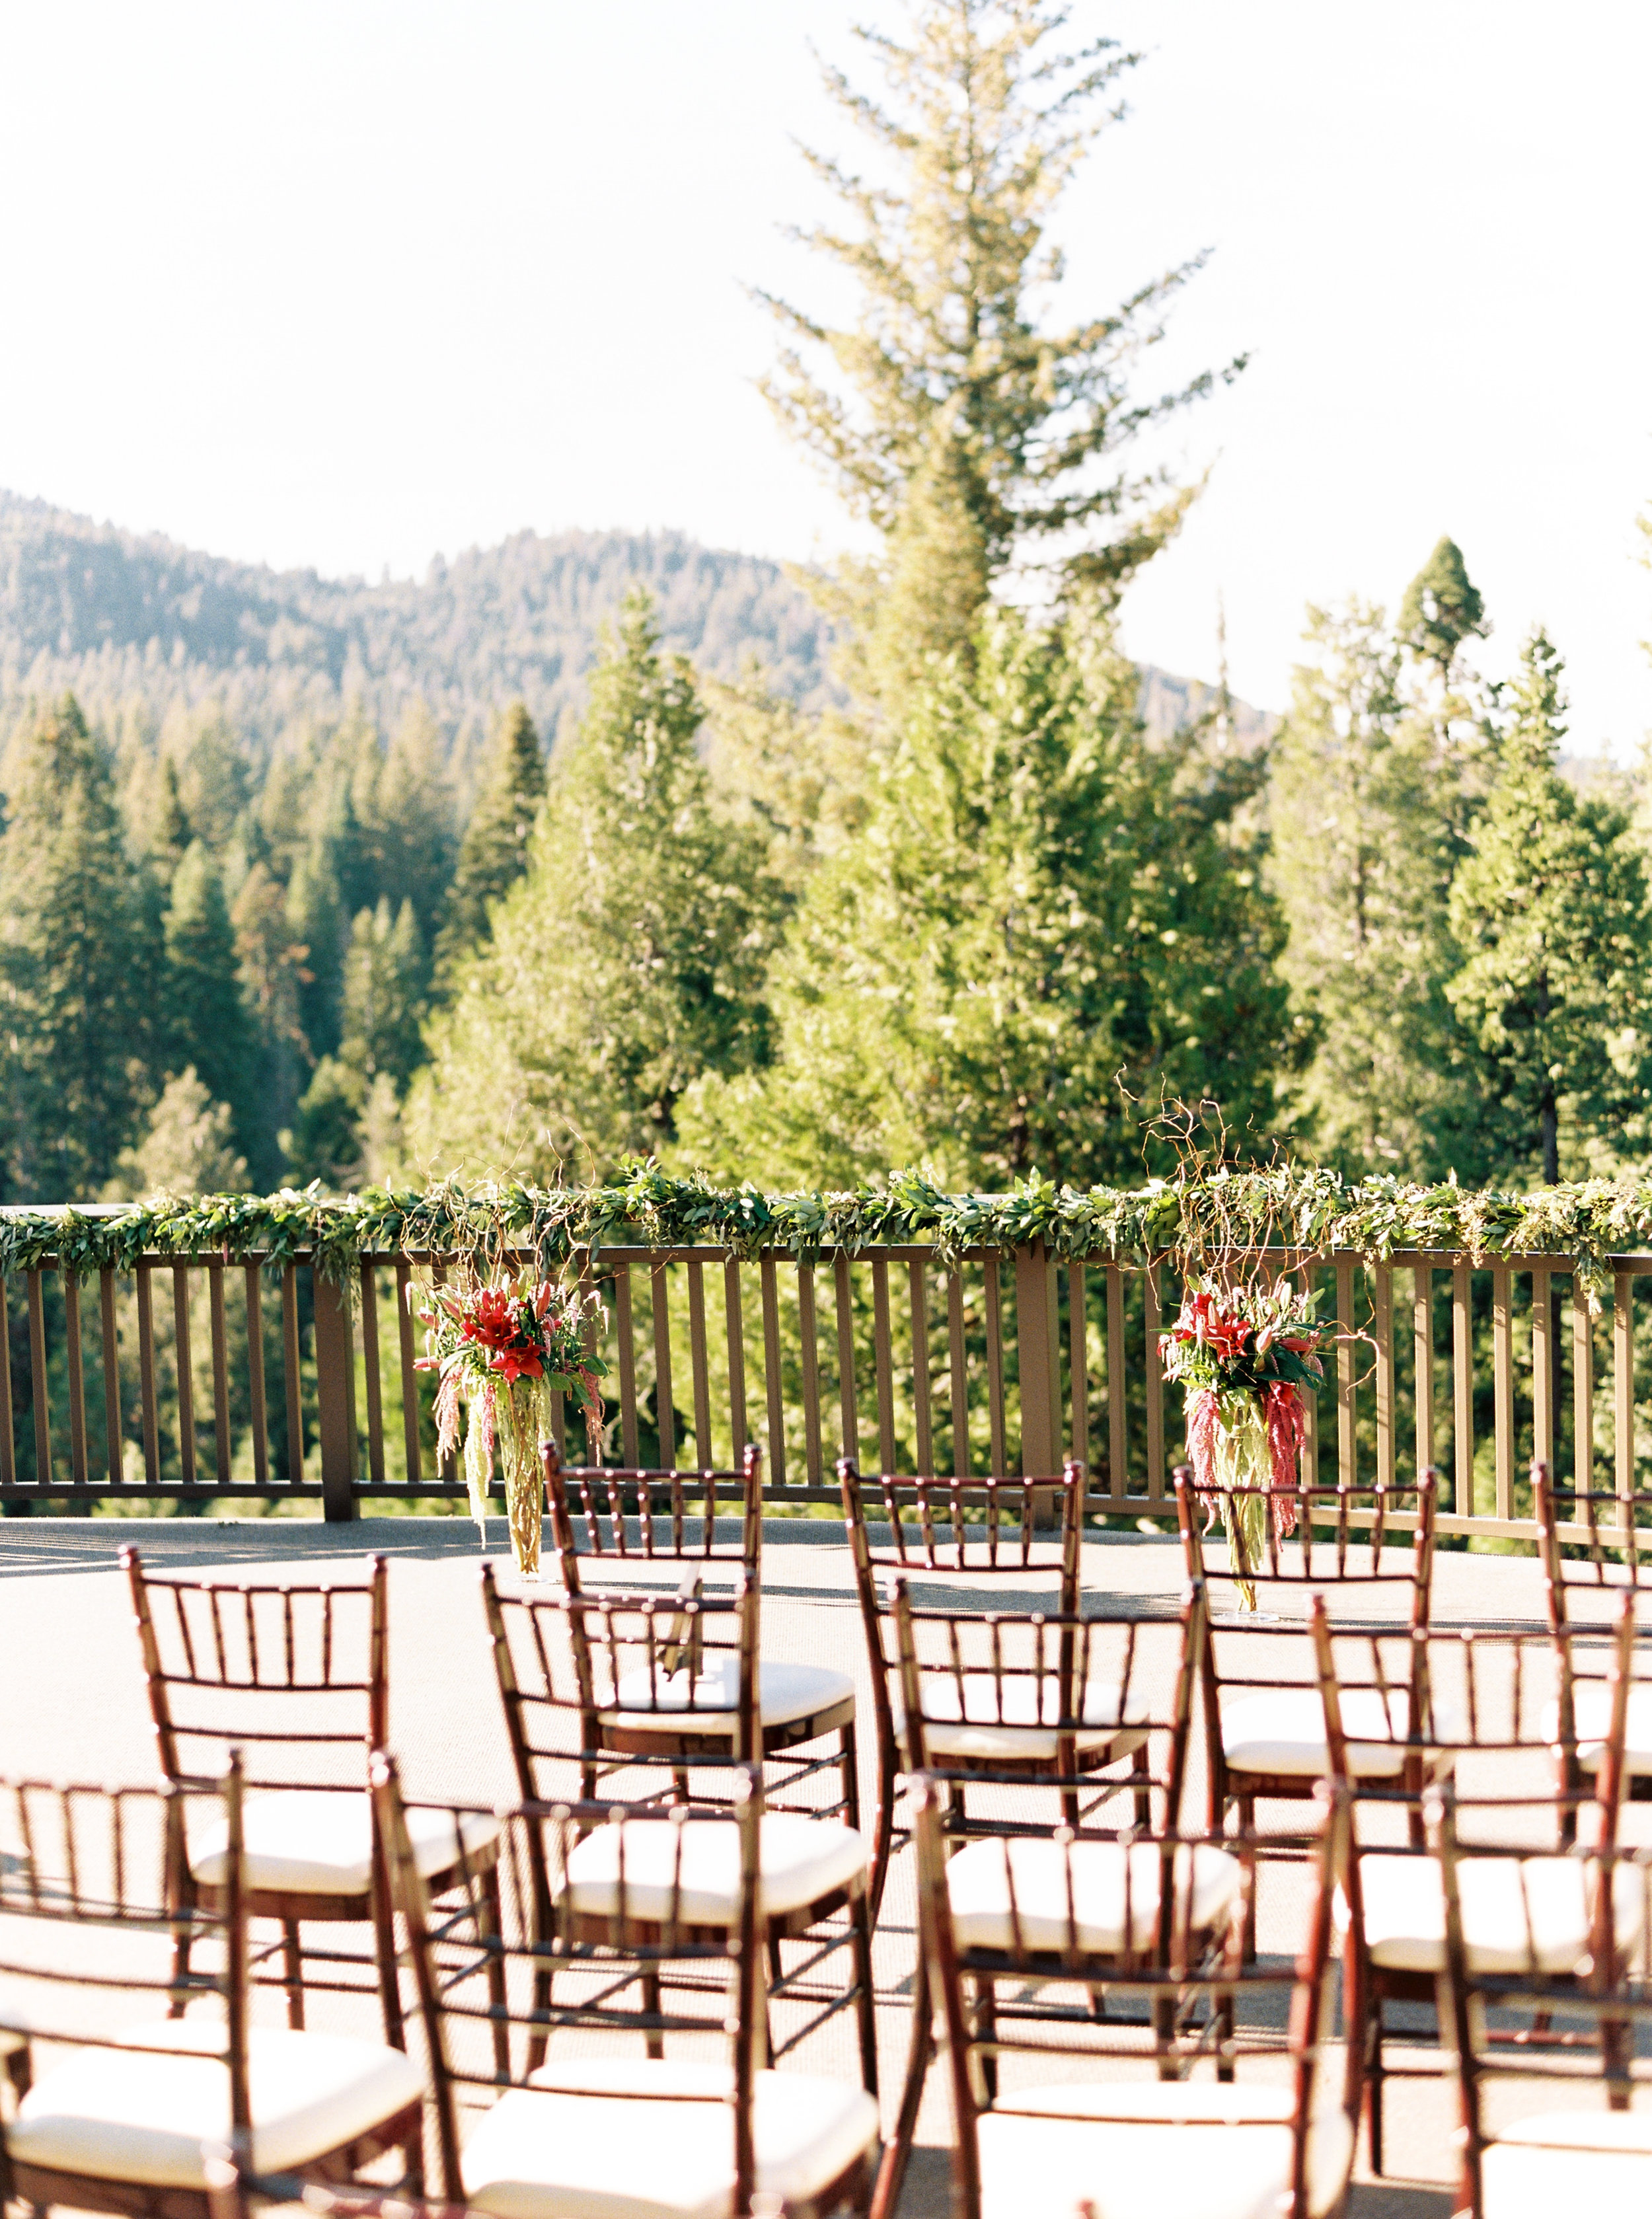 Tenaya-lodge-wedding-at-yosemite-national-park-california-98.jpg